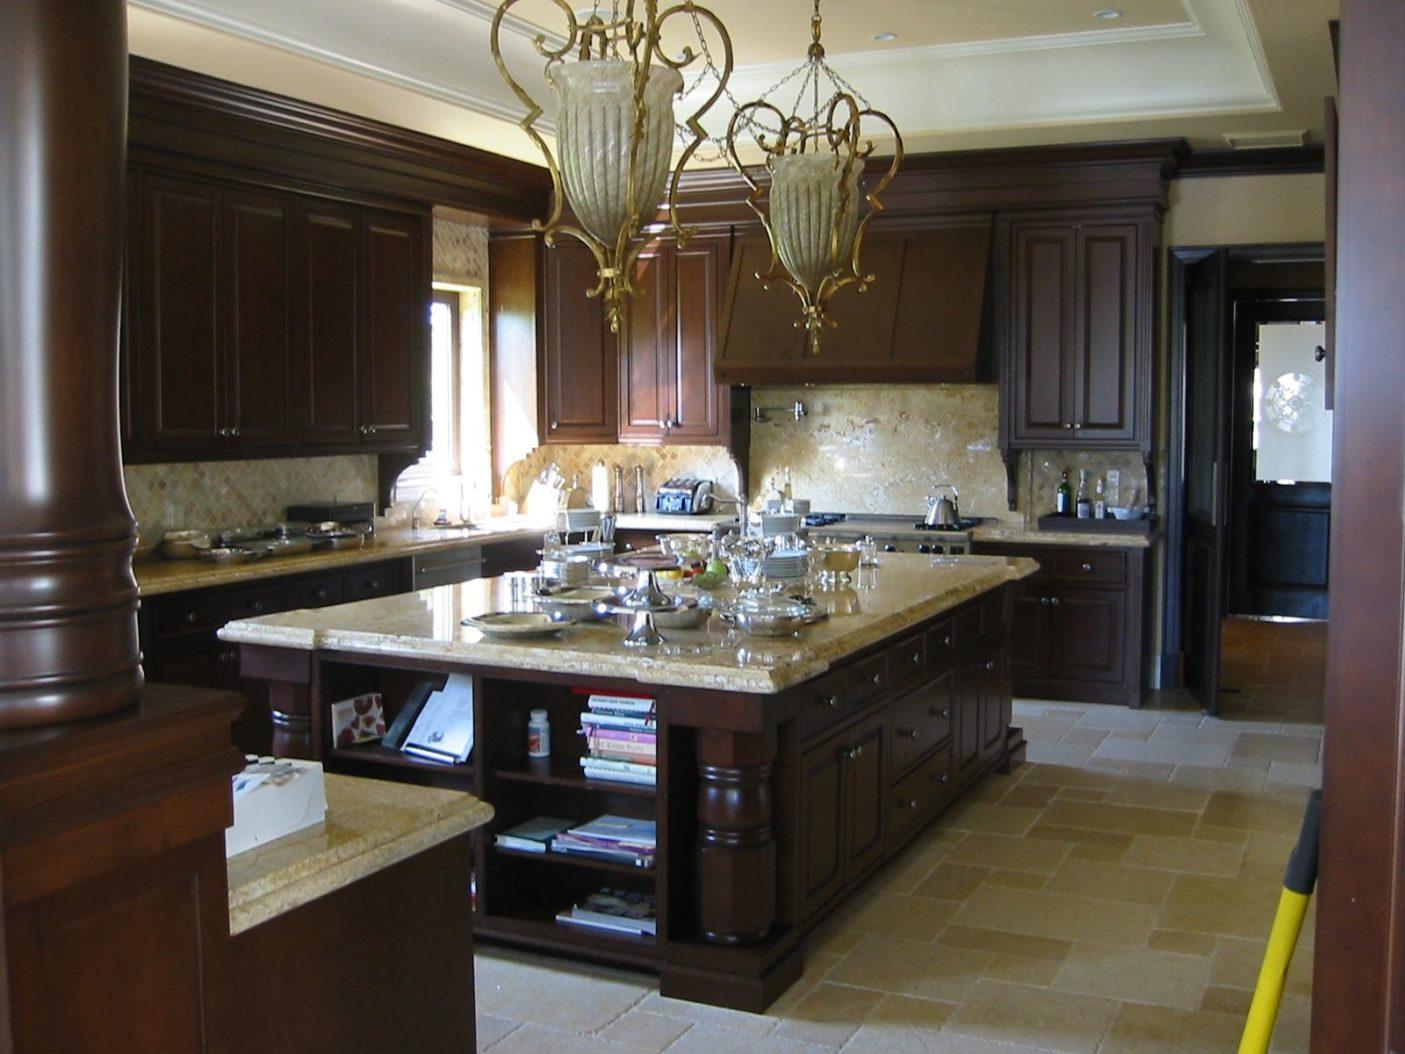 Kitchens-184.jpg